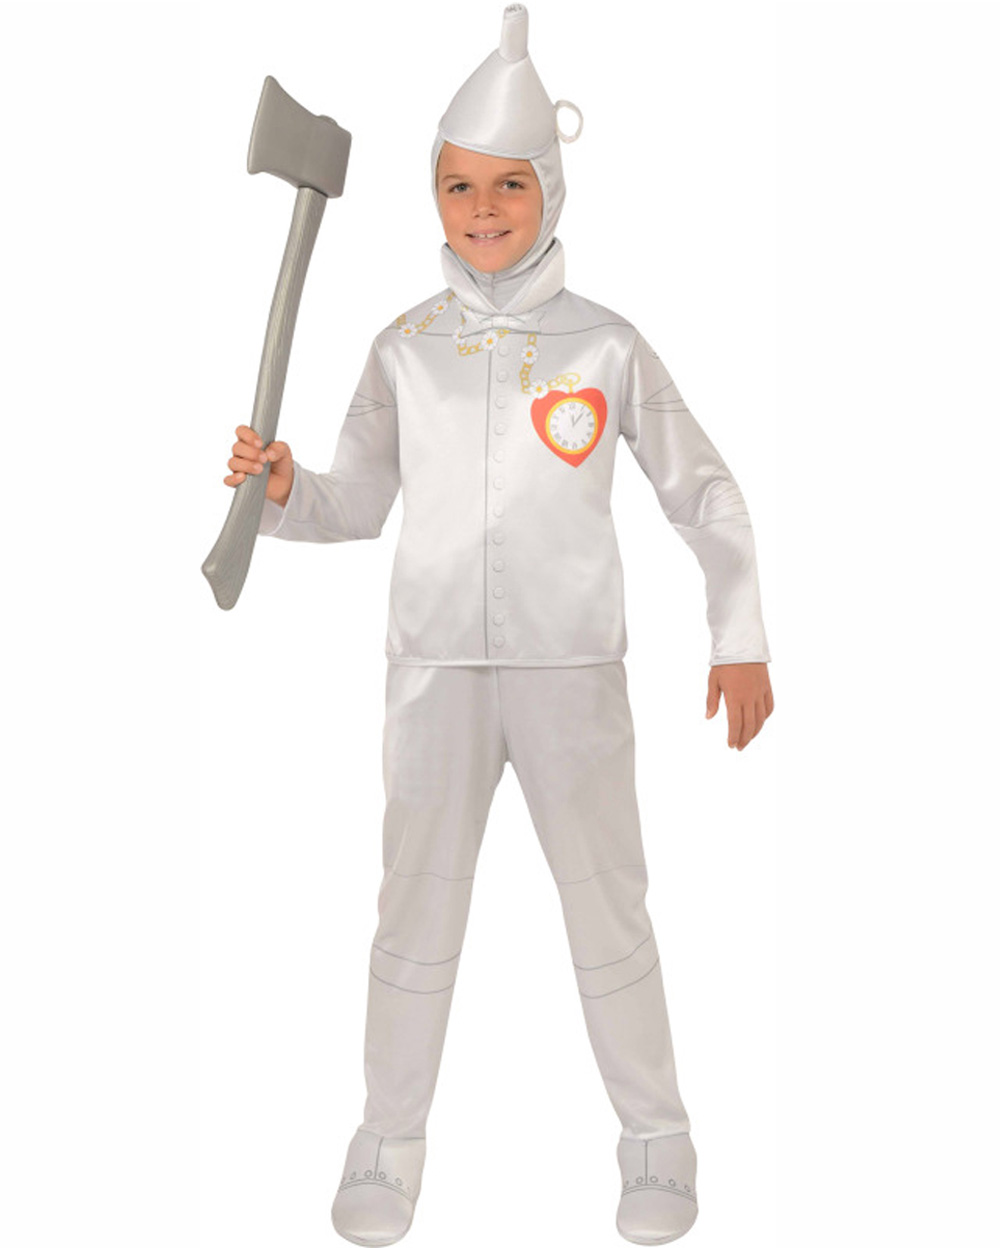 CK336 The Wizard of Oz Tinman Child Boys Girls Costume Fancy Dress Up Bookweek